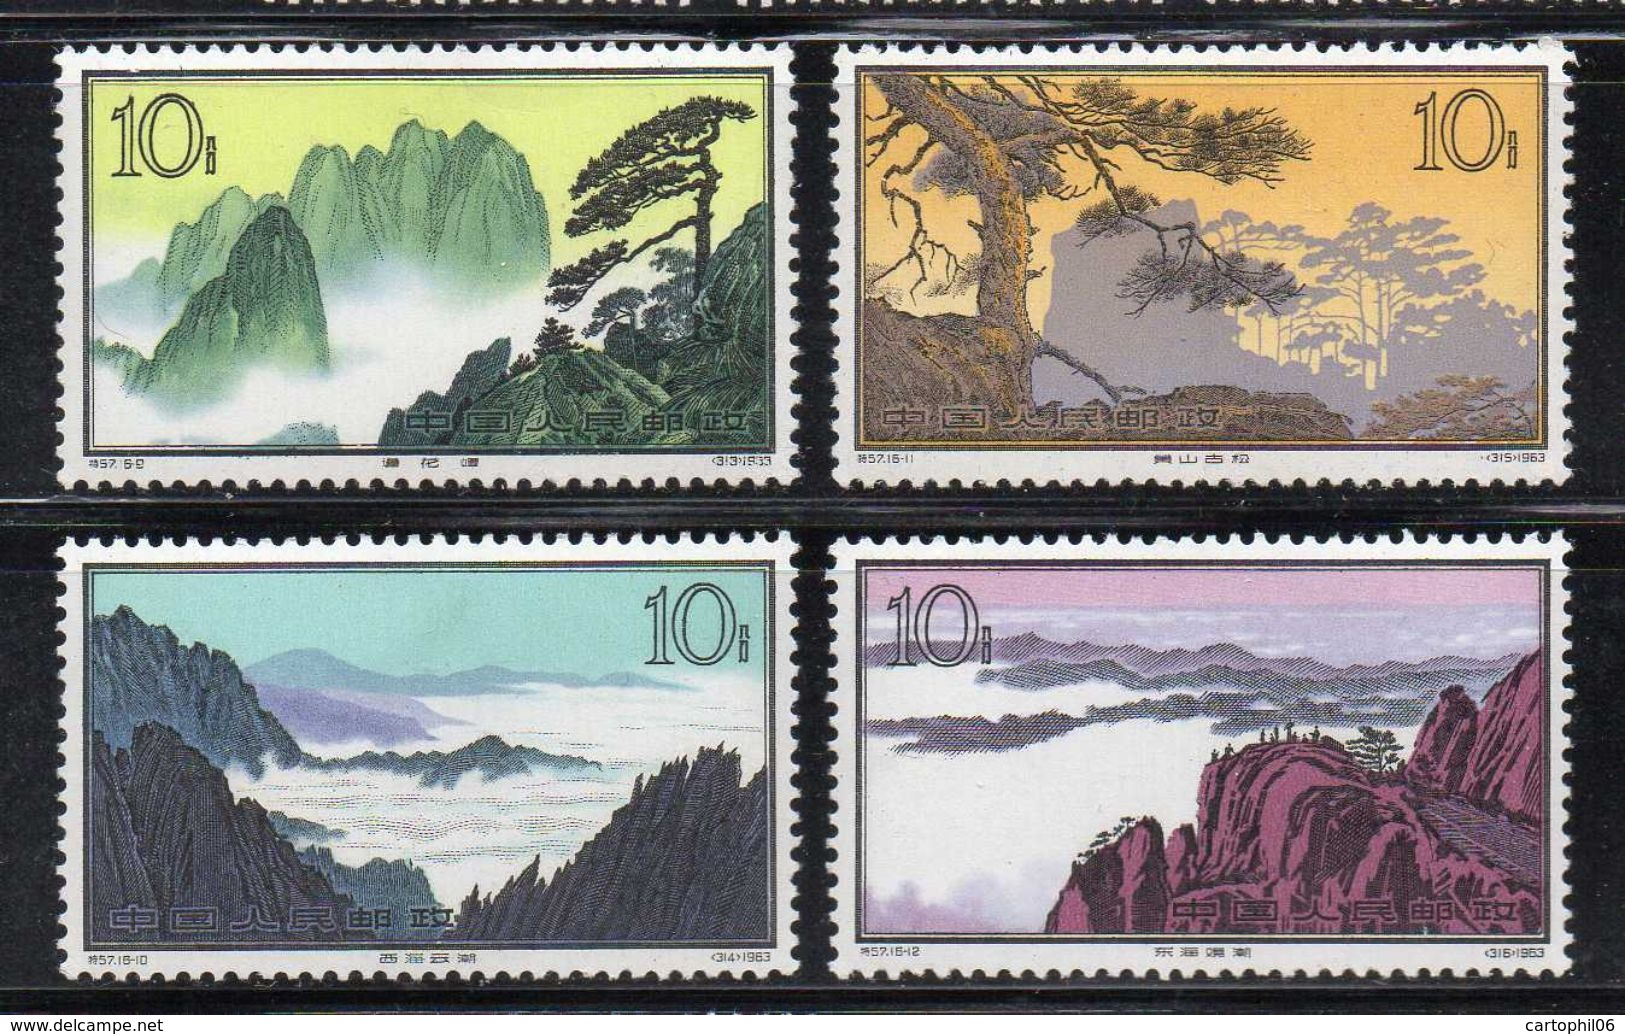 - CHINE - Yvert & Tellier N° 1501/16 Neufs ** - Série Complète PAYSAGES DU HOUANGSHAN 1963 - Cote 1000 EUR - - Neufs